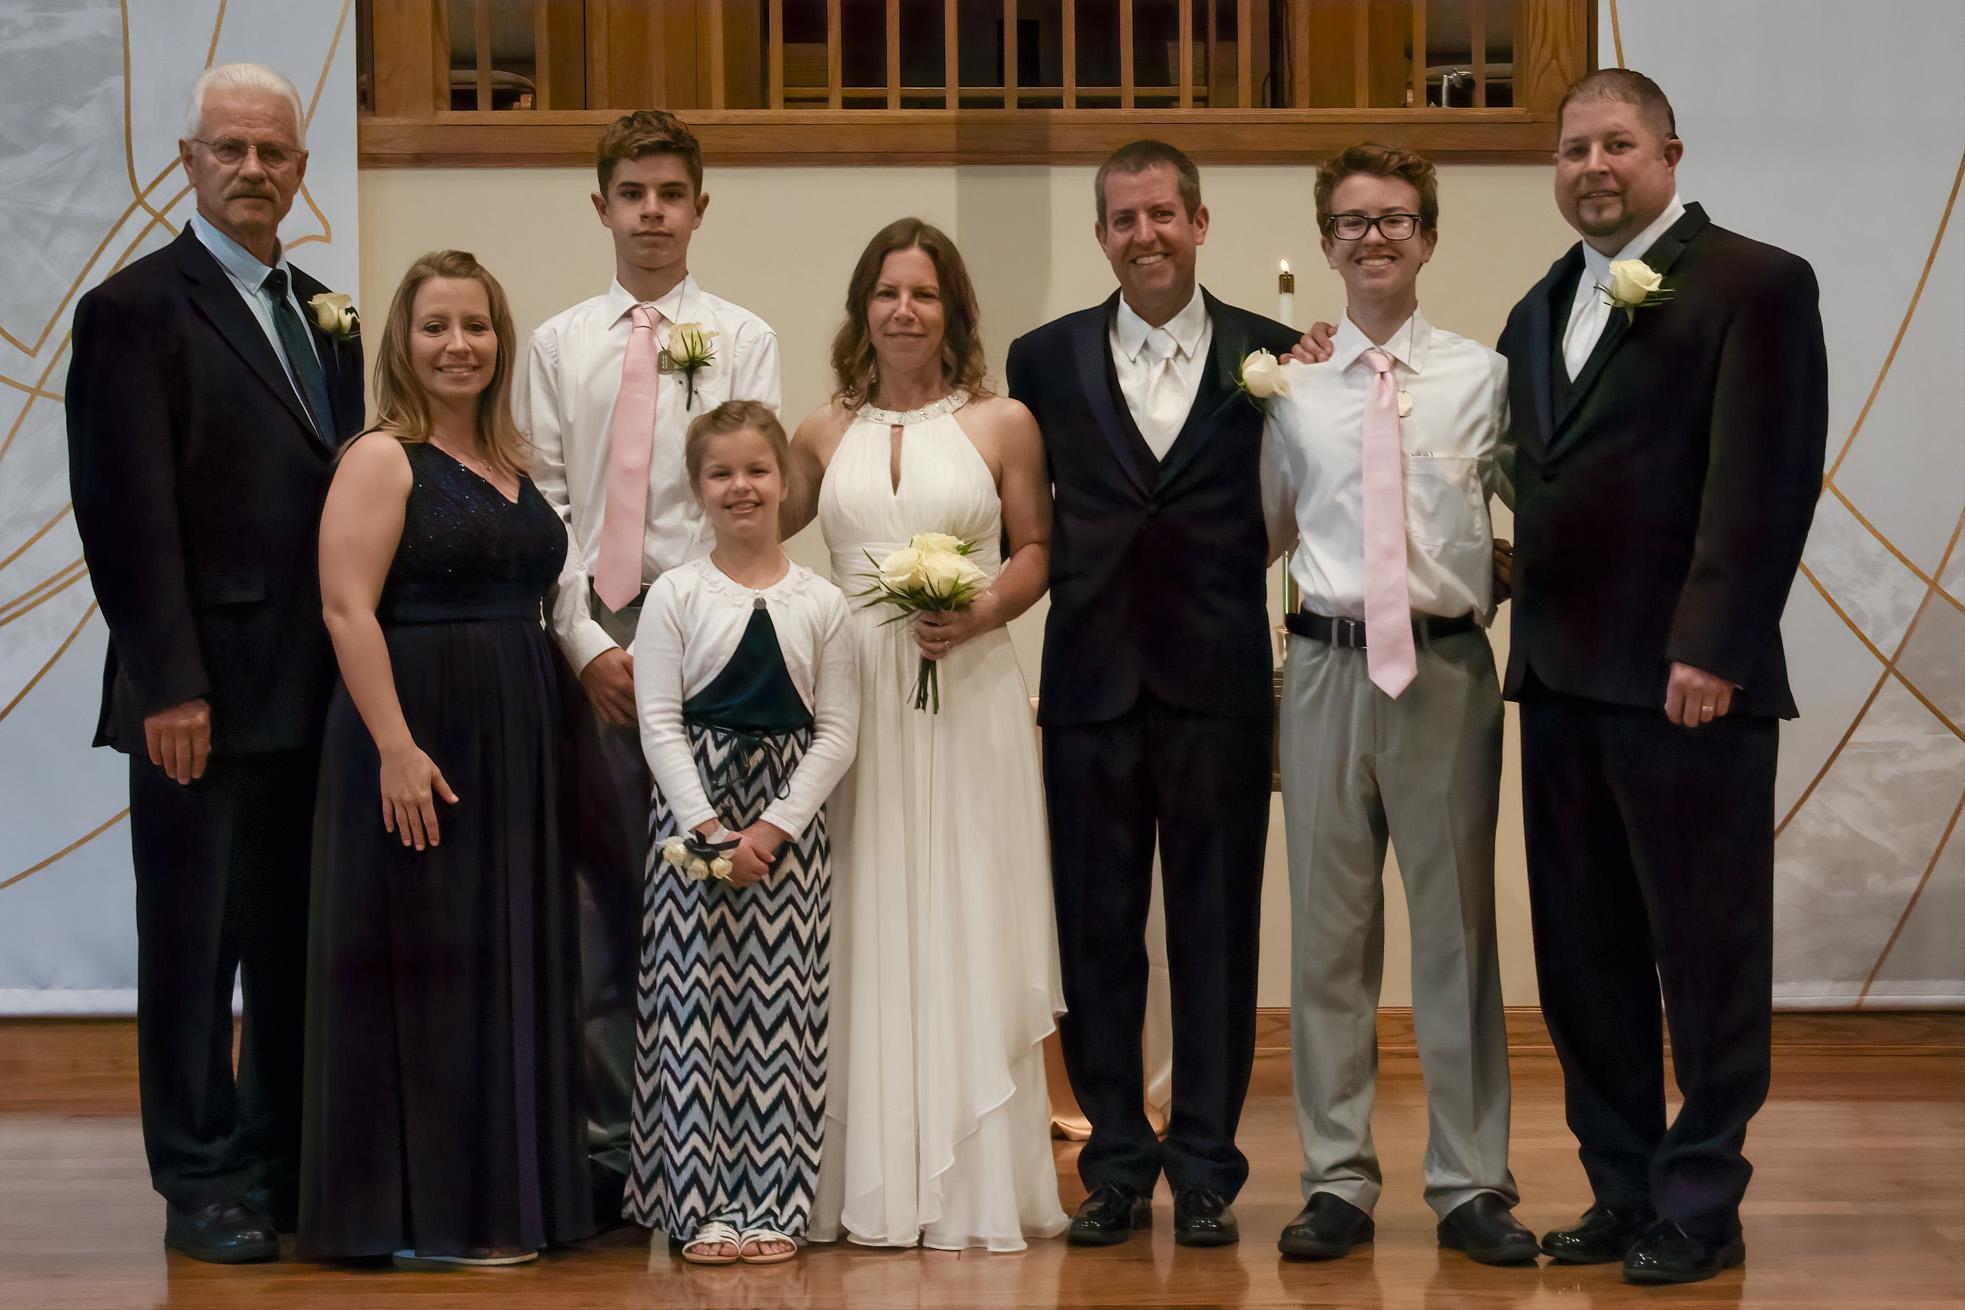 cylekristinwedding (42 of 47).jpg